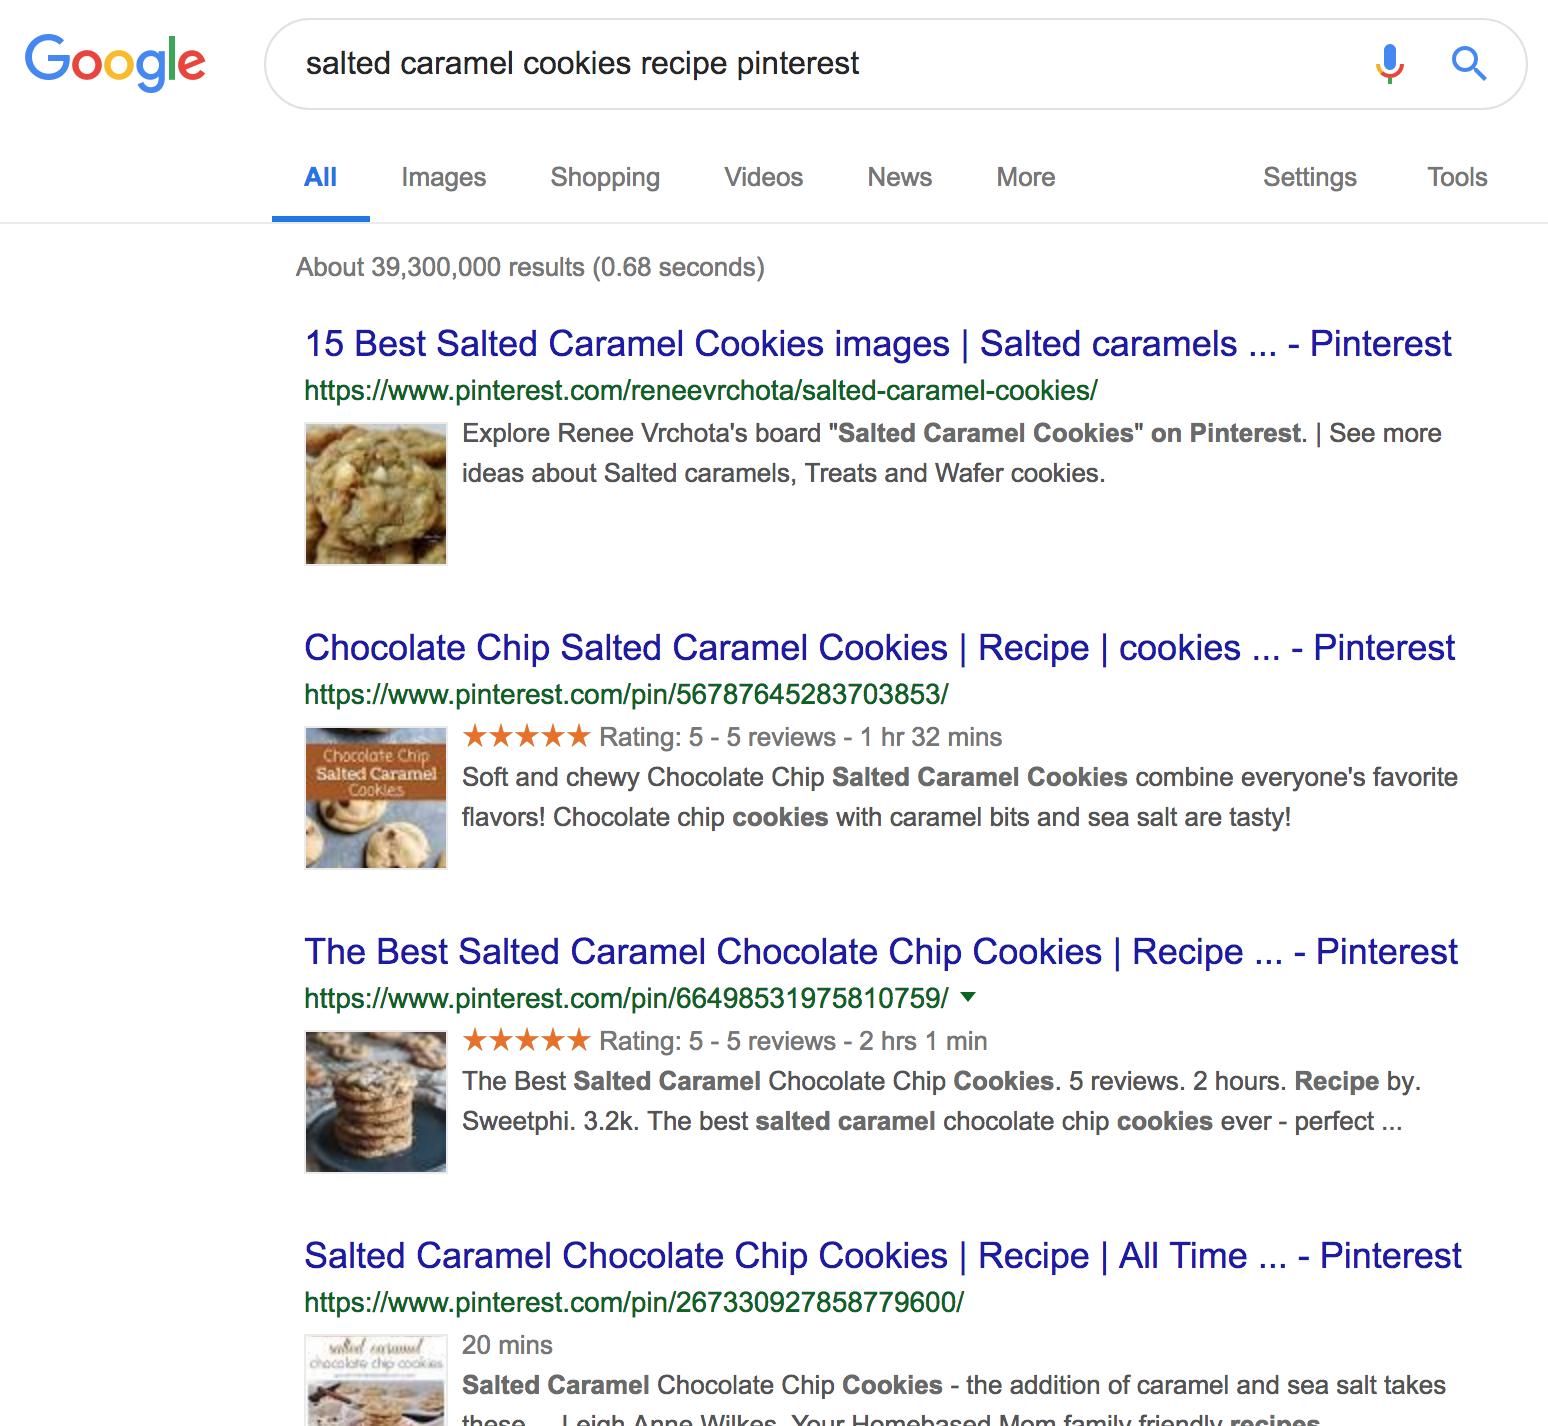 salted caramel cookies - #pinterest #pinterestva #virtualassistant #google